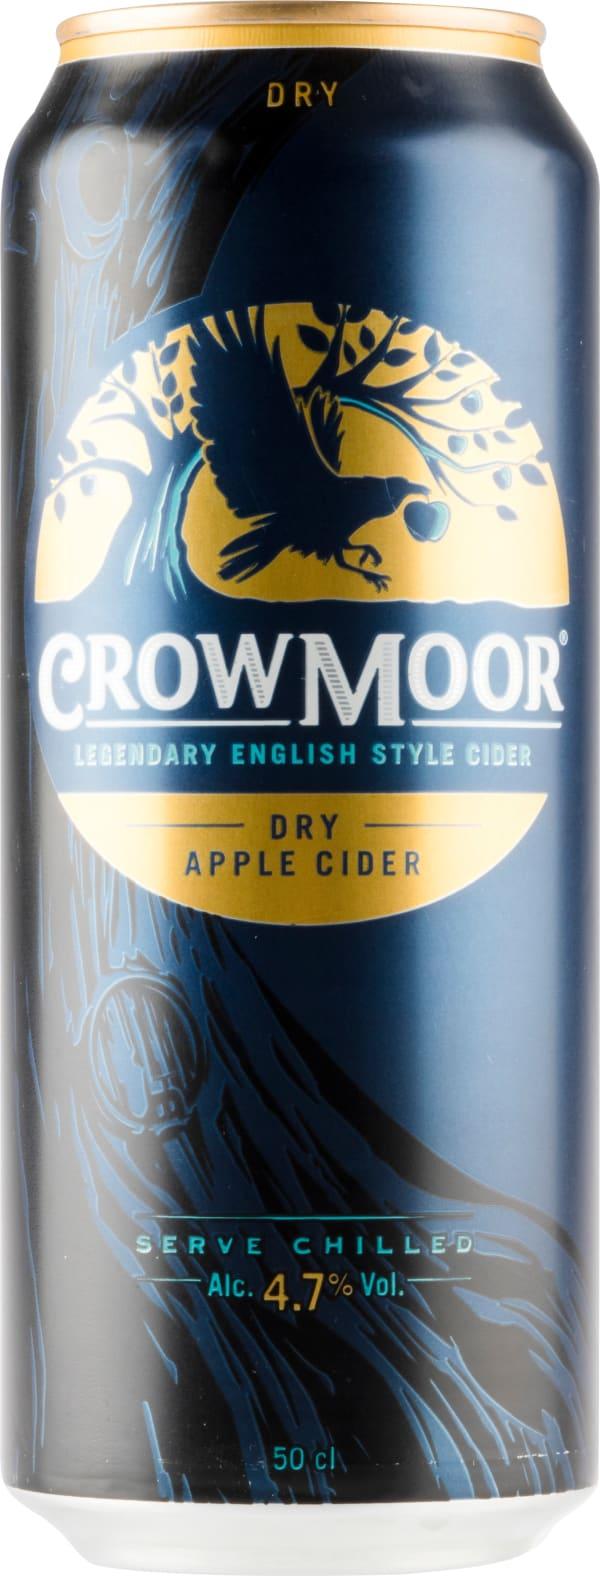 Crowmoor Dry can